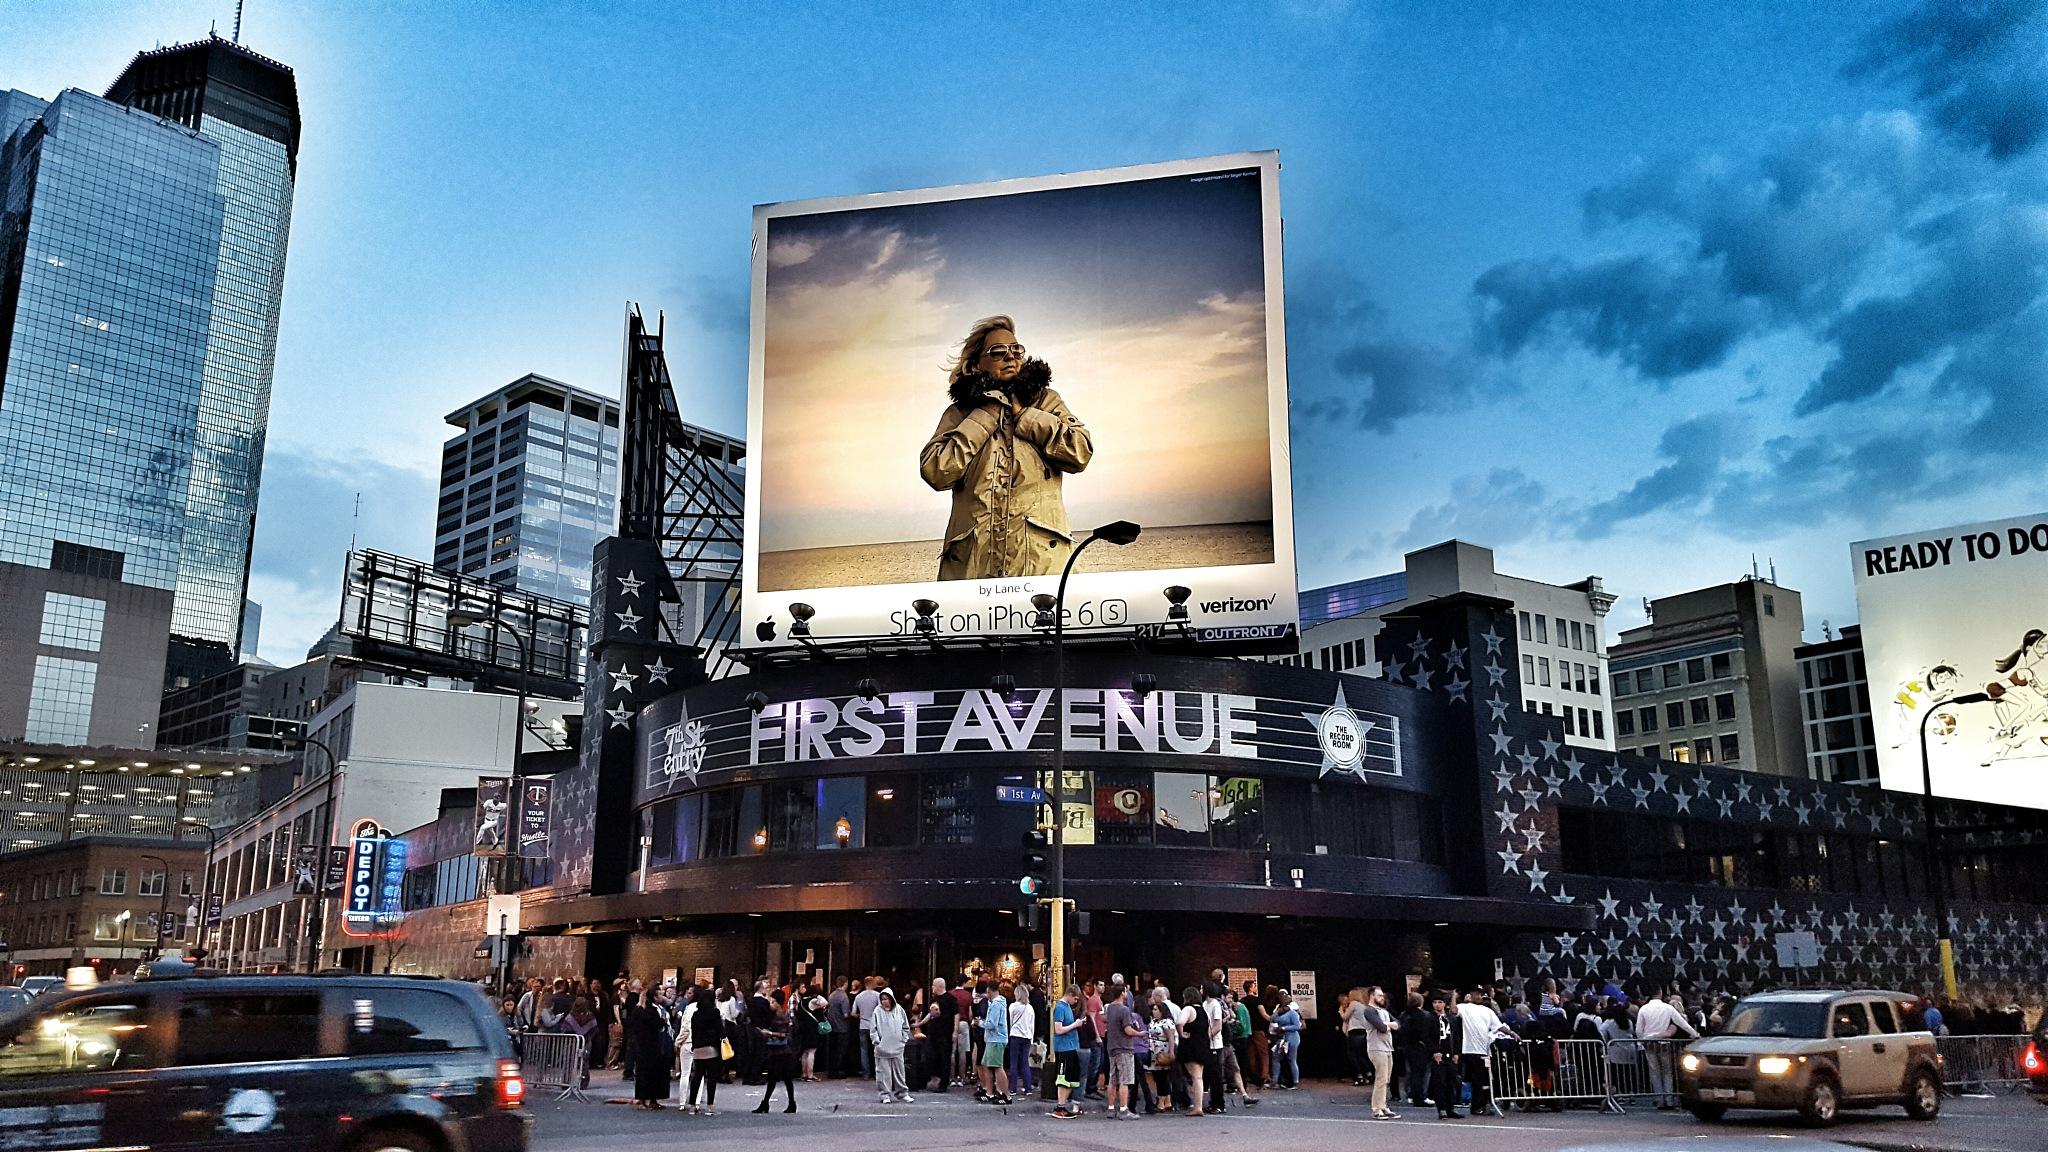 First Avenue - Minneapolis, MN by rcktgrl85